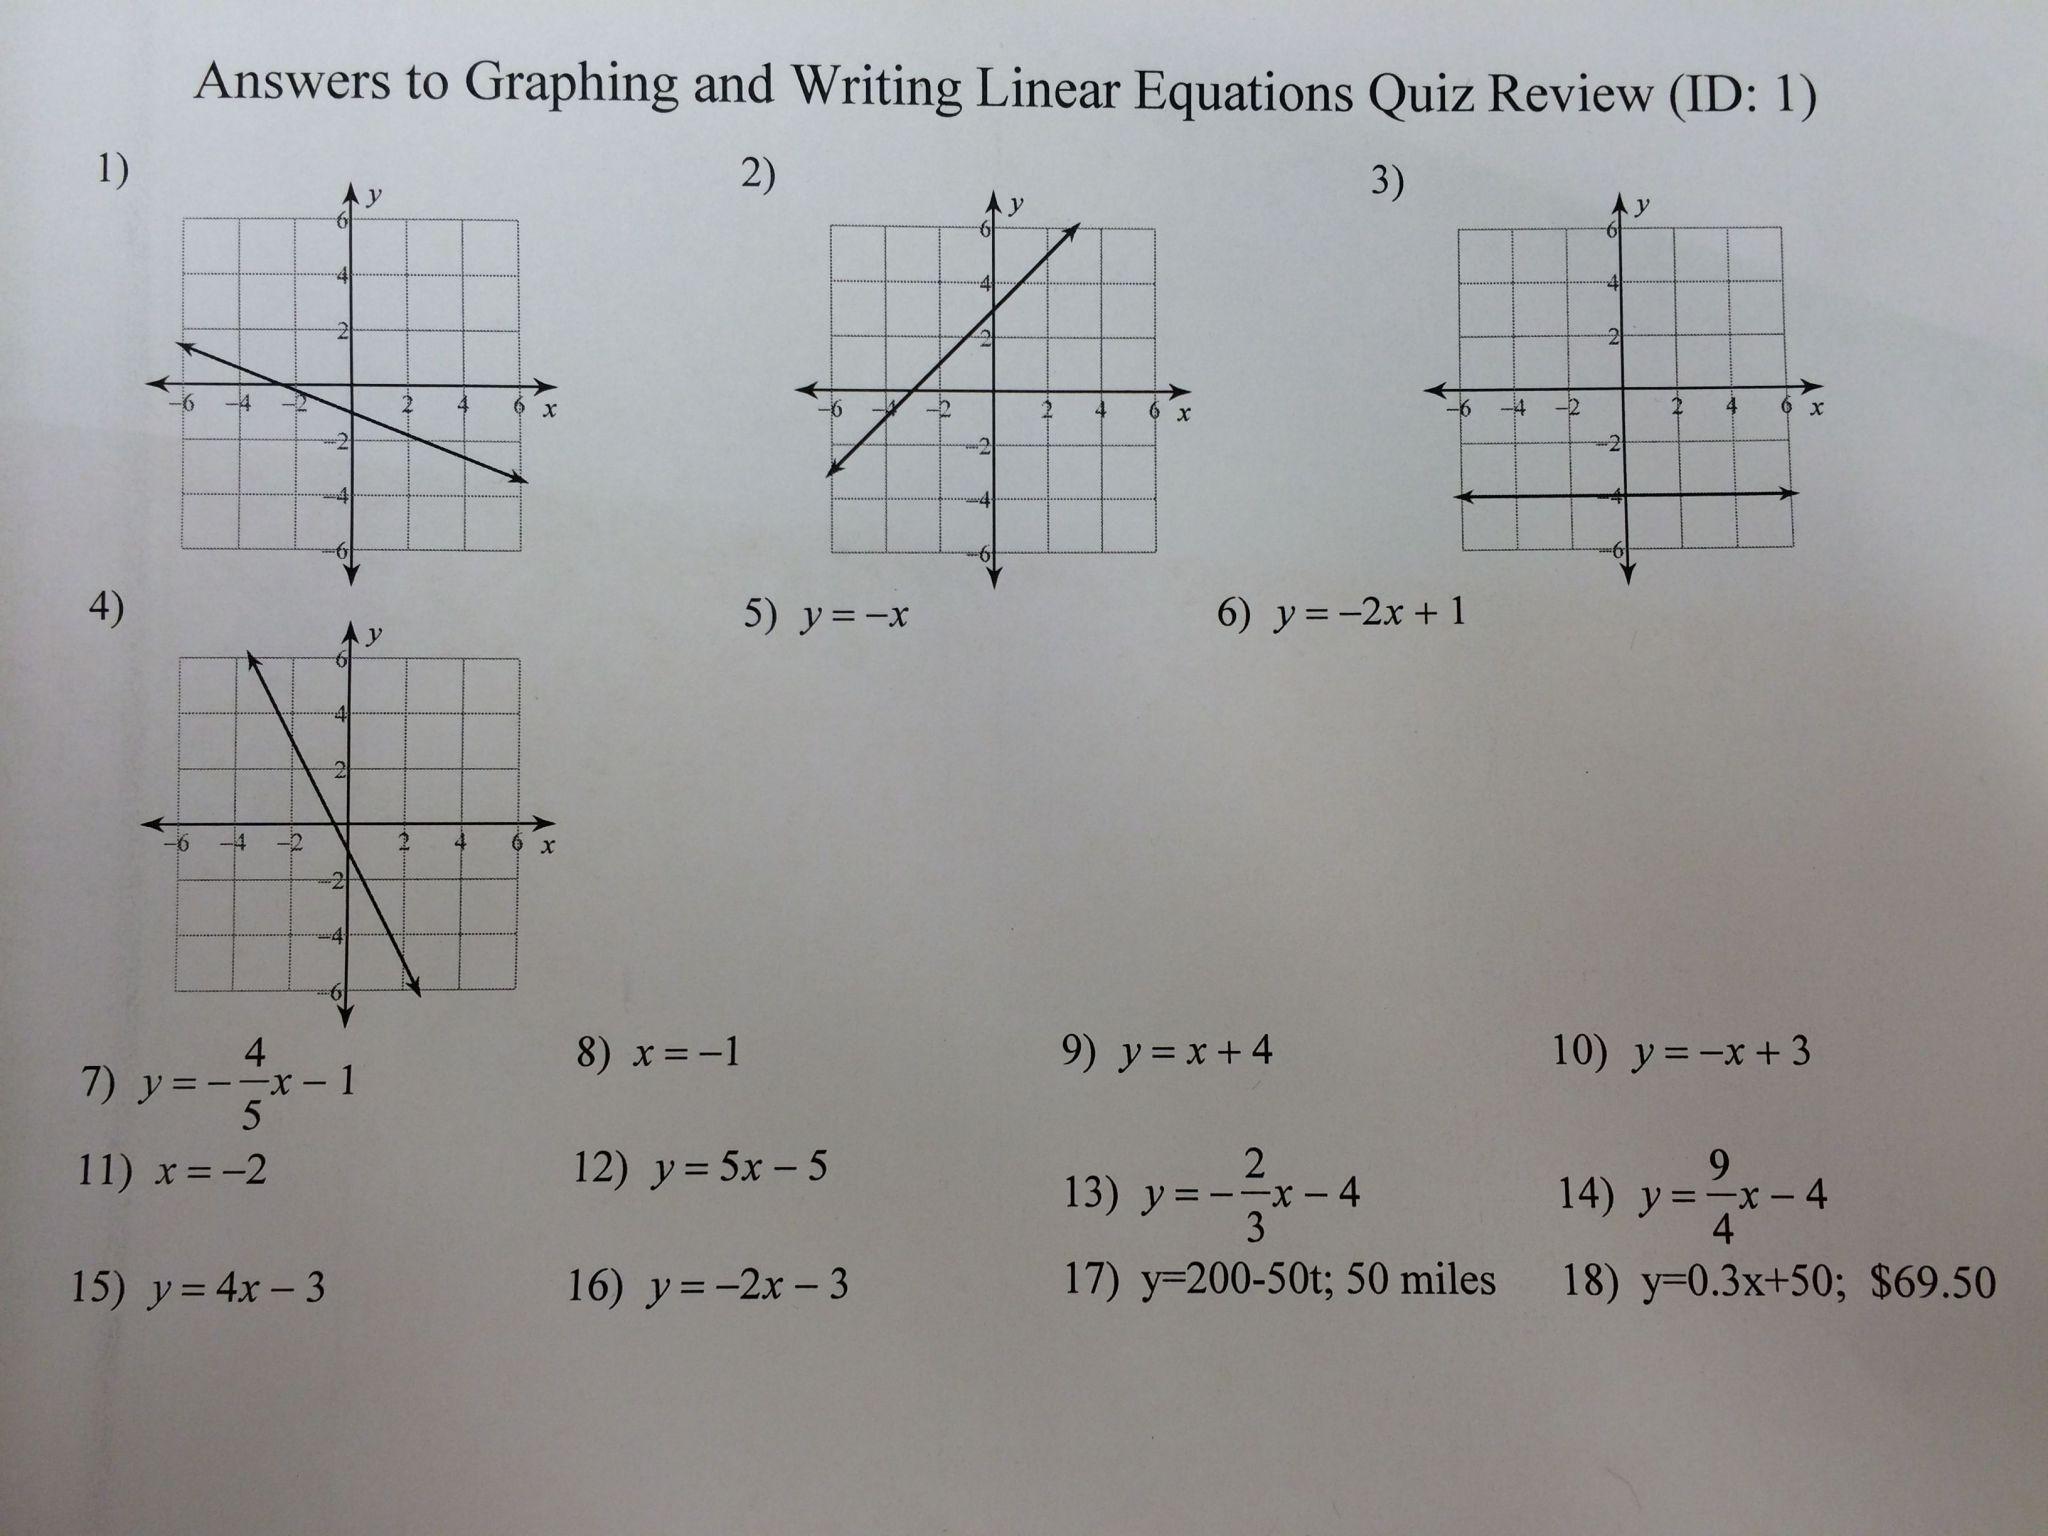 Books Never Written Geometry Worksheet Answers